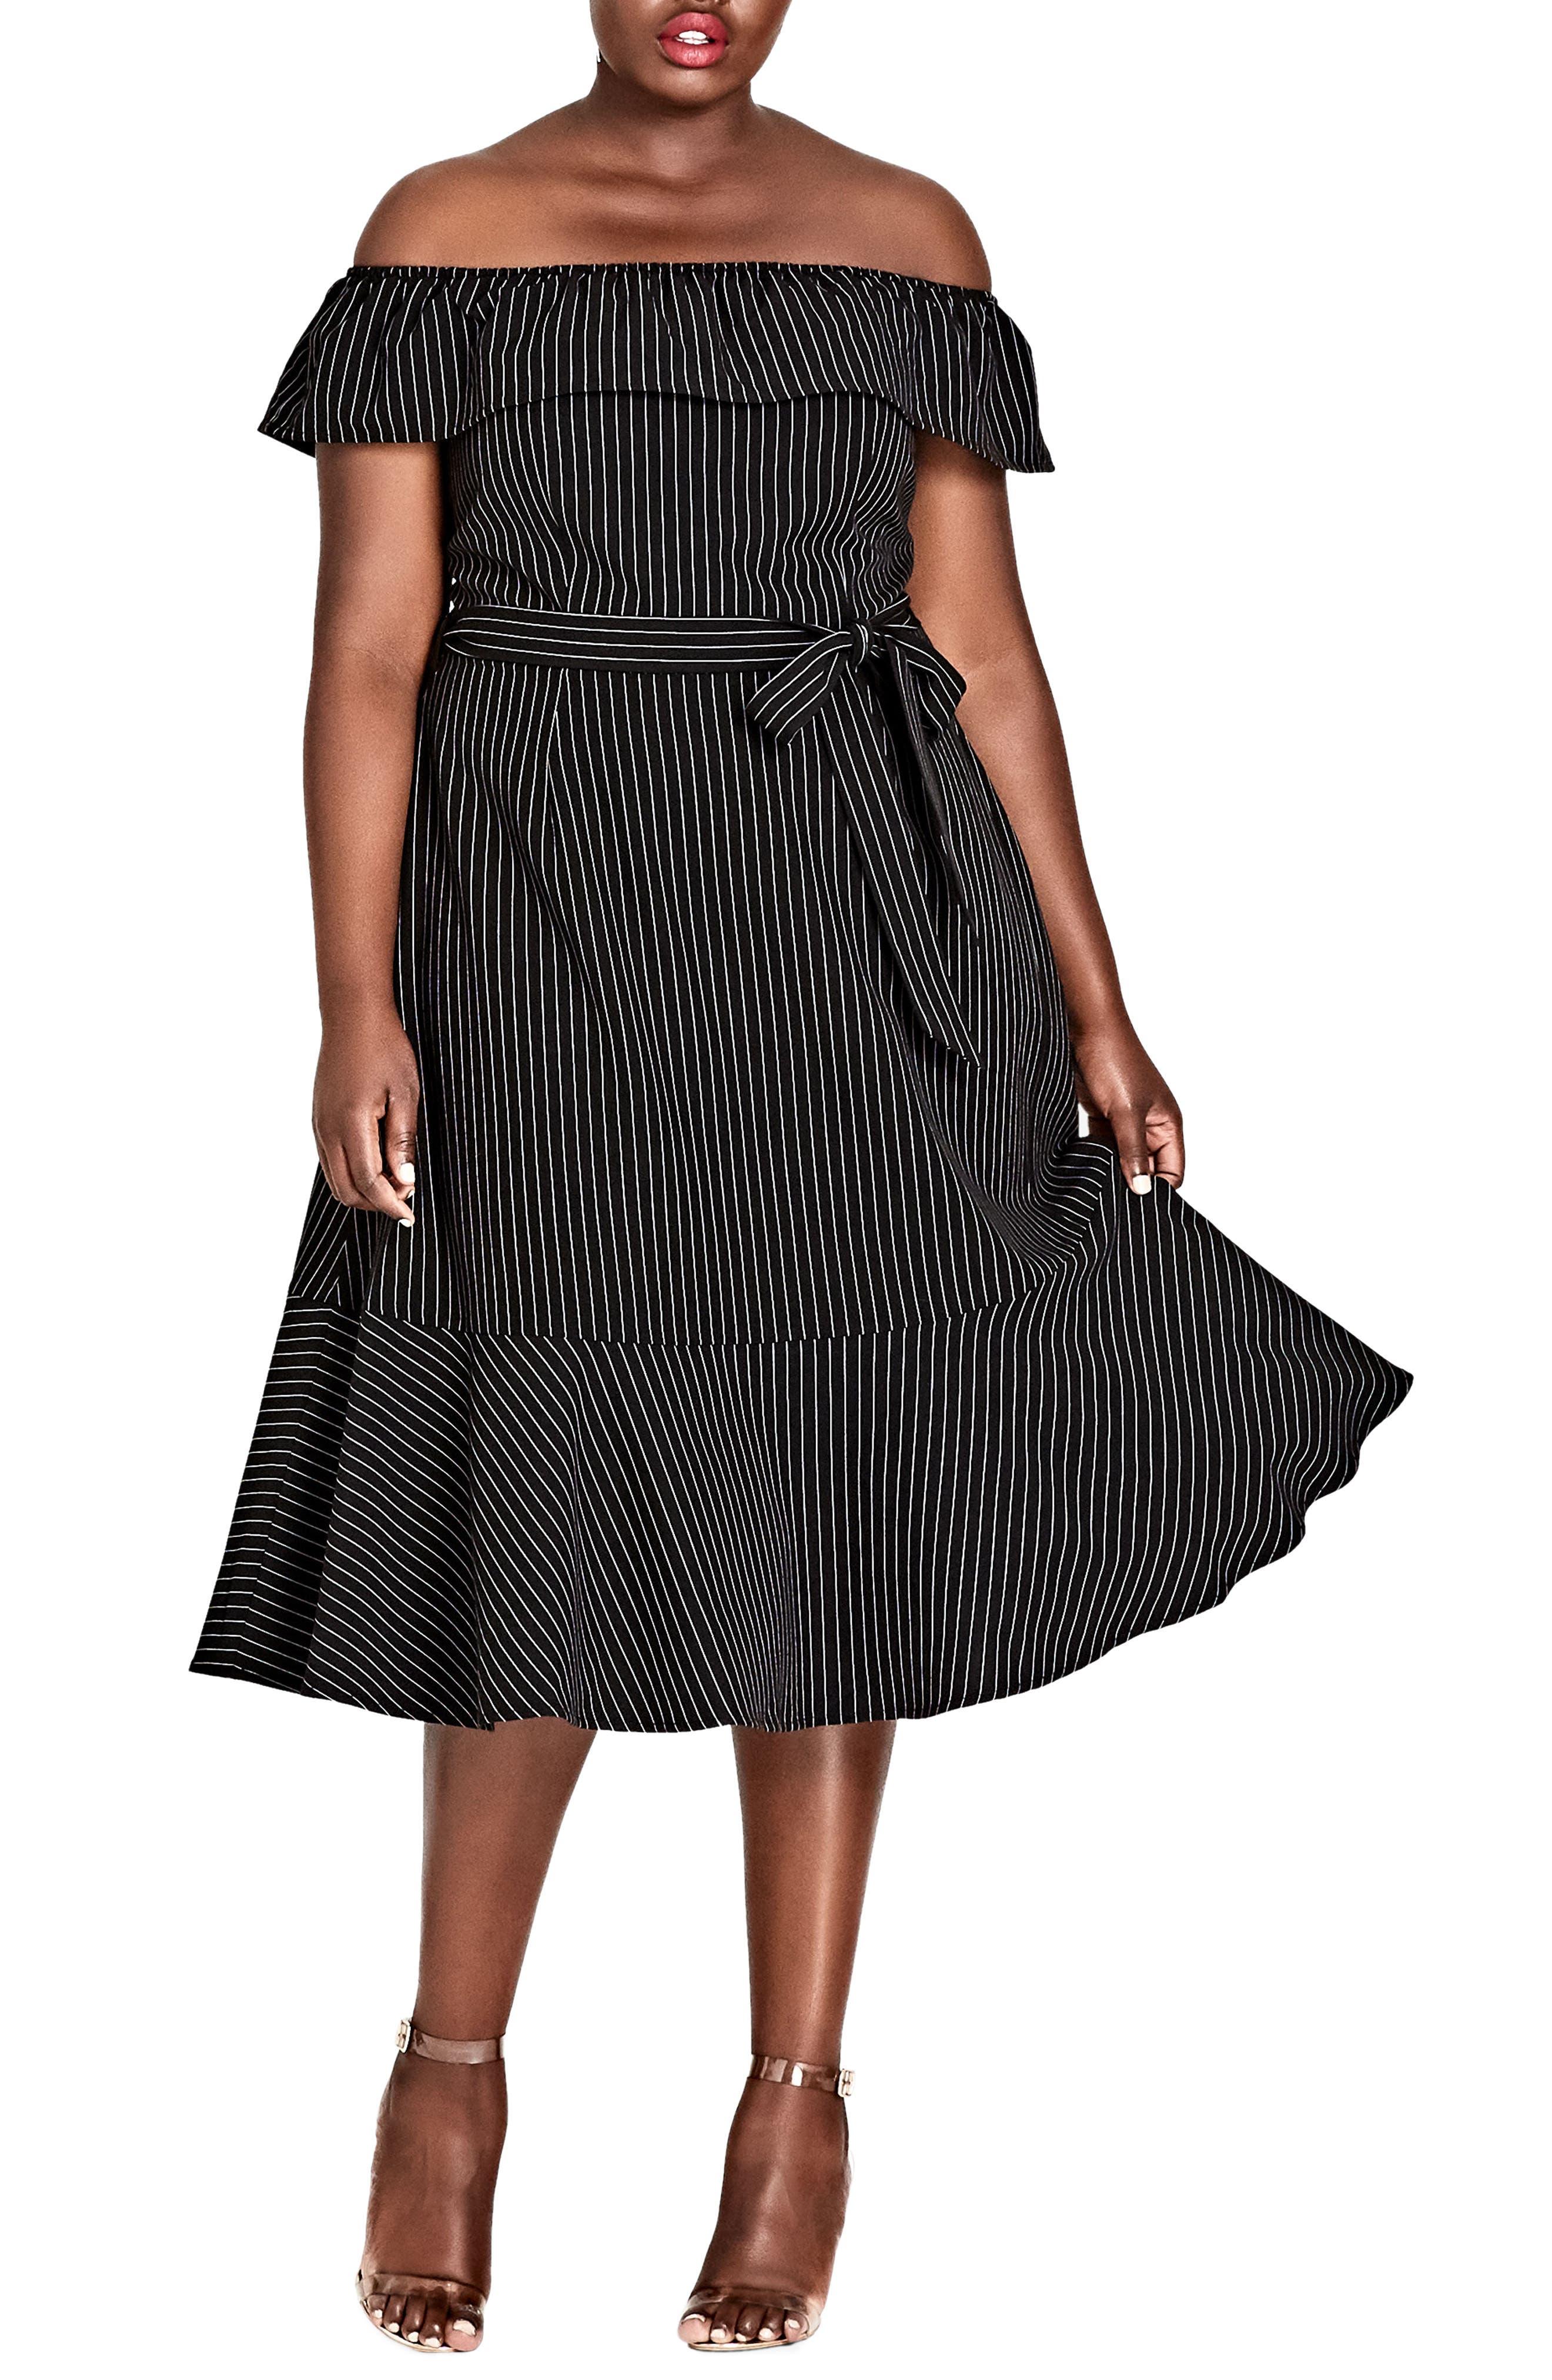 CITY CHIC Midi Madame Stripe Off the Shoulder Dress, Main, color, BLACK